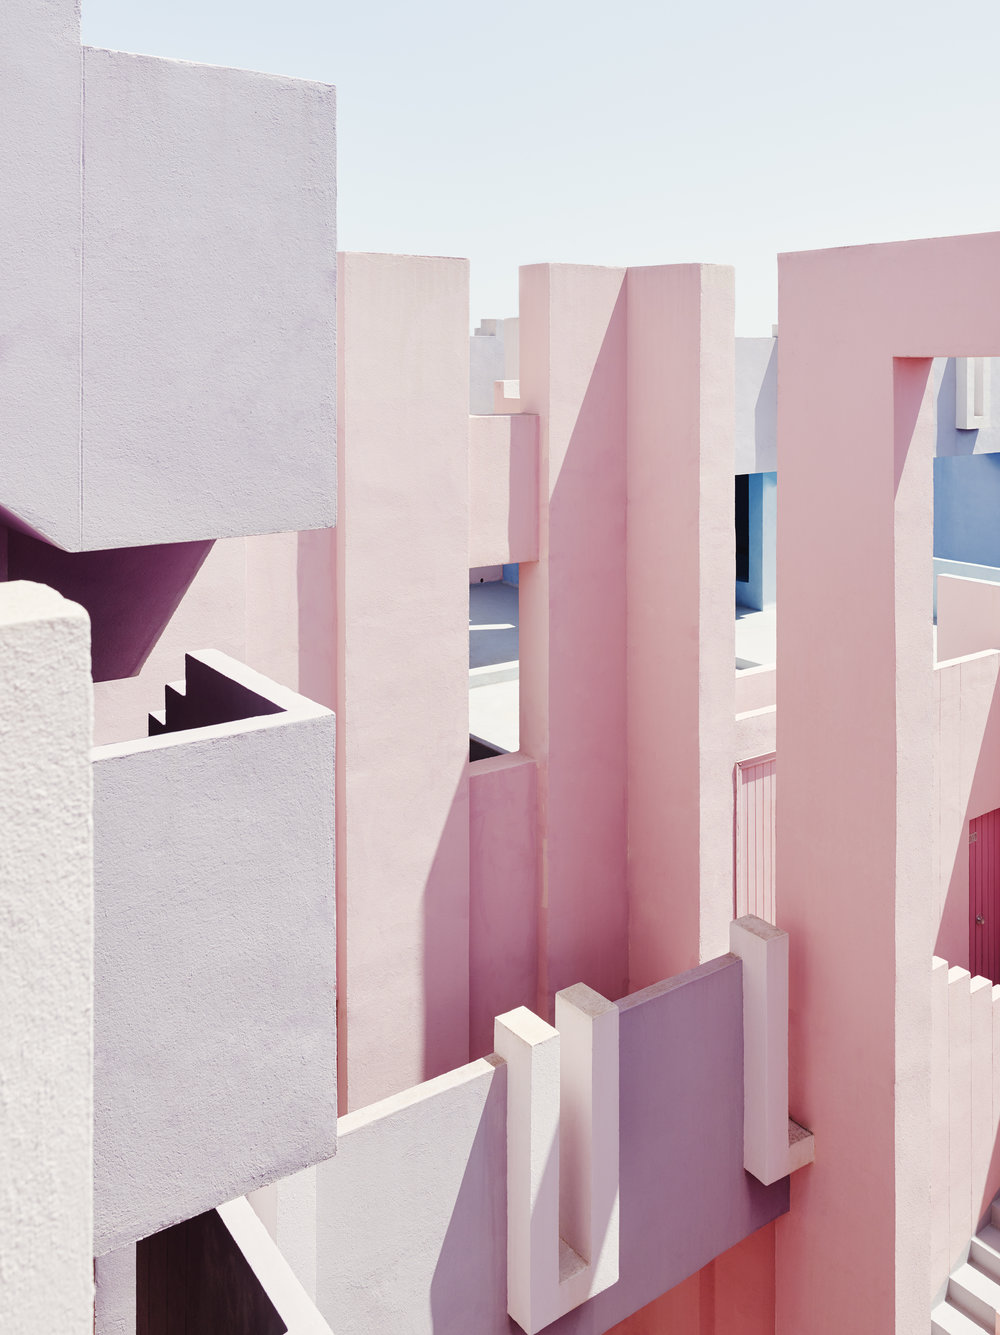 Muralla_Roja_Calpe_Spain_Ricardo_Bofill_Taller_Arquitectura_011.jpg